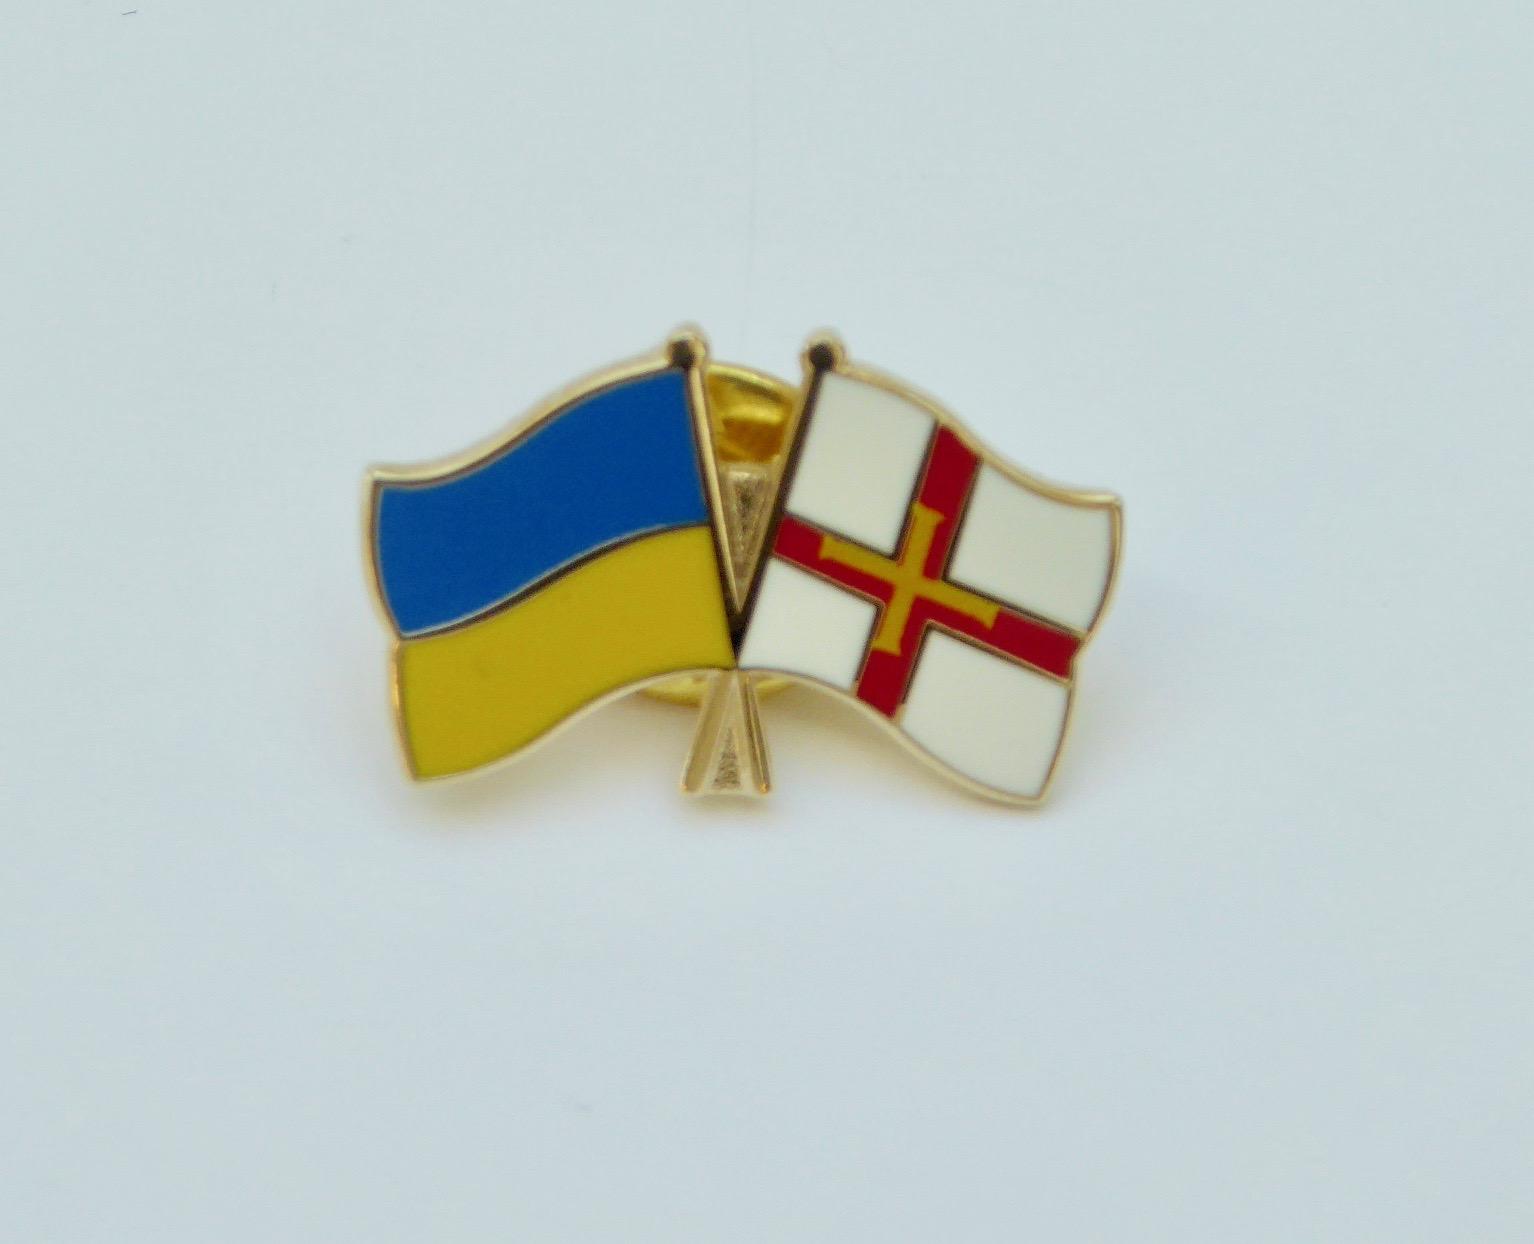 GSY Biberach pin badges